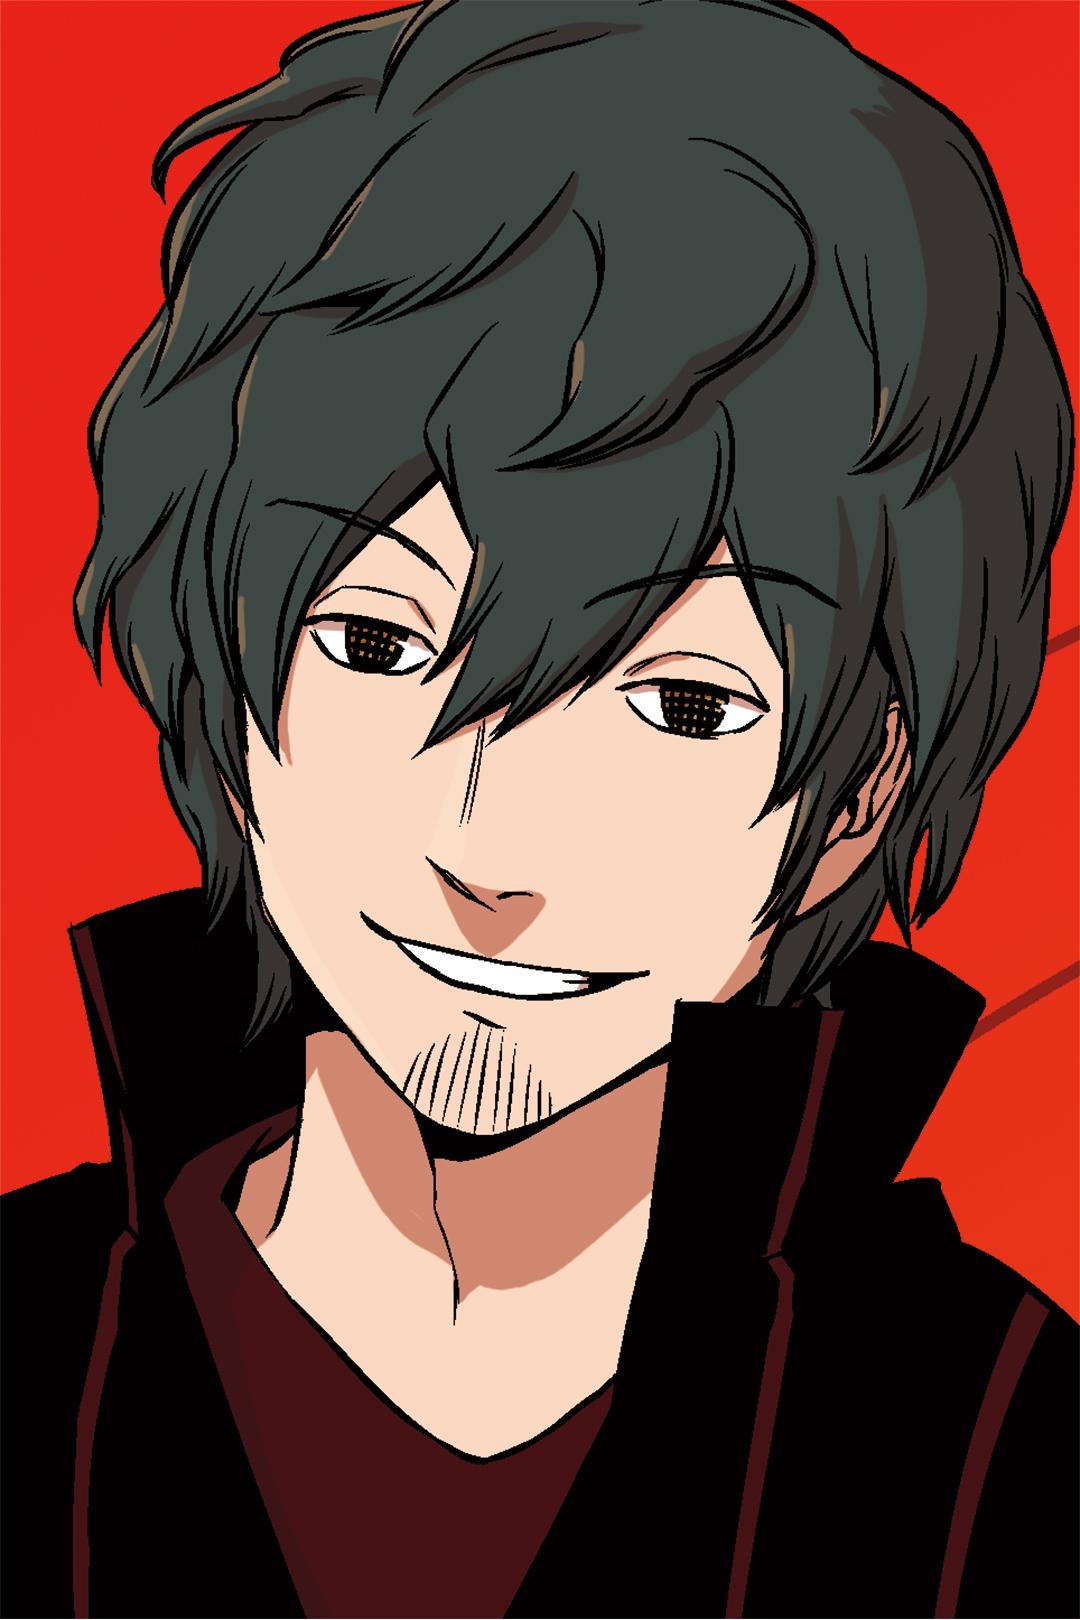 Arquivo:Tachikawa Portrait.jpg